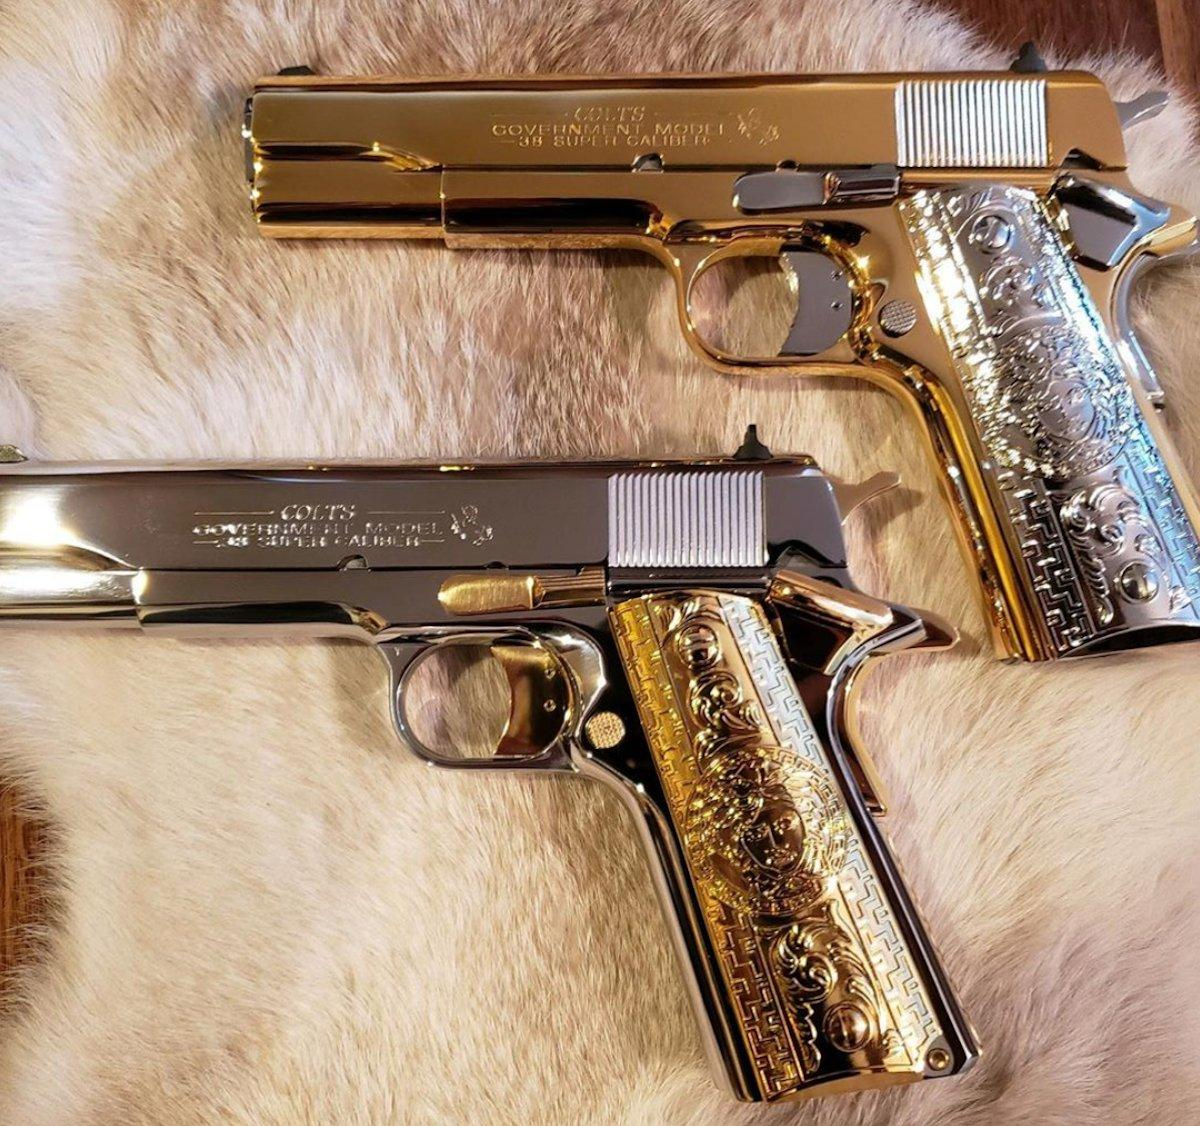 tim-malcolm-guns-90-day-fiancepng-1570485172775.jpg